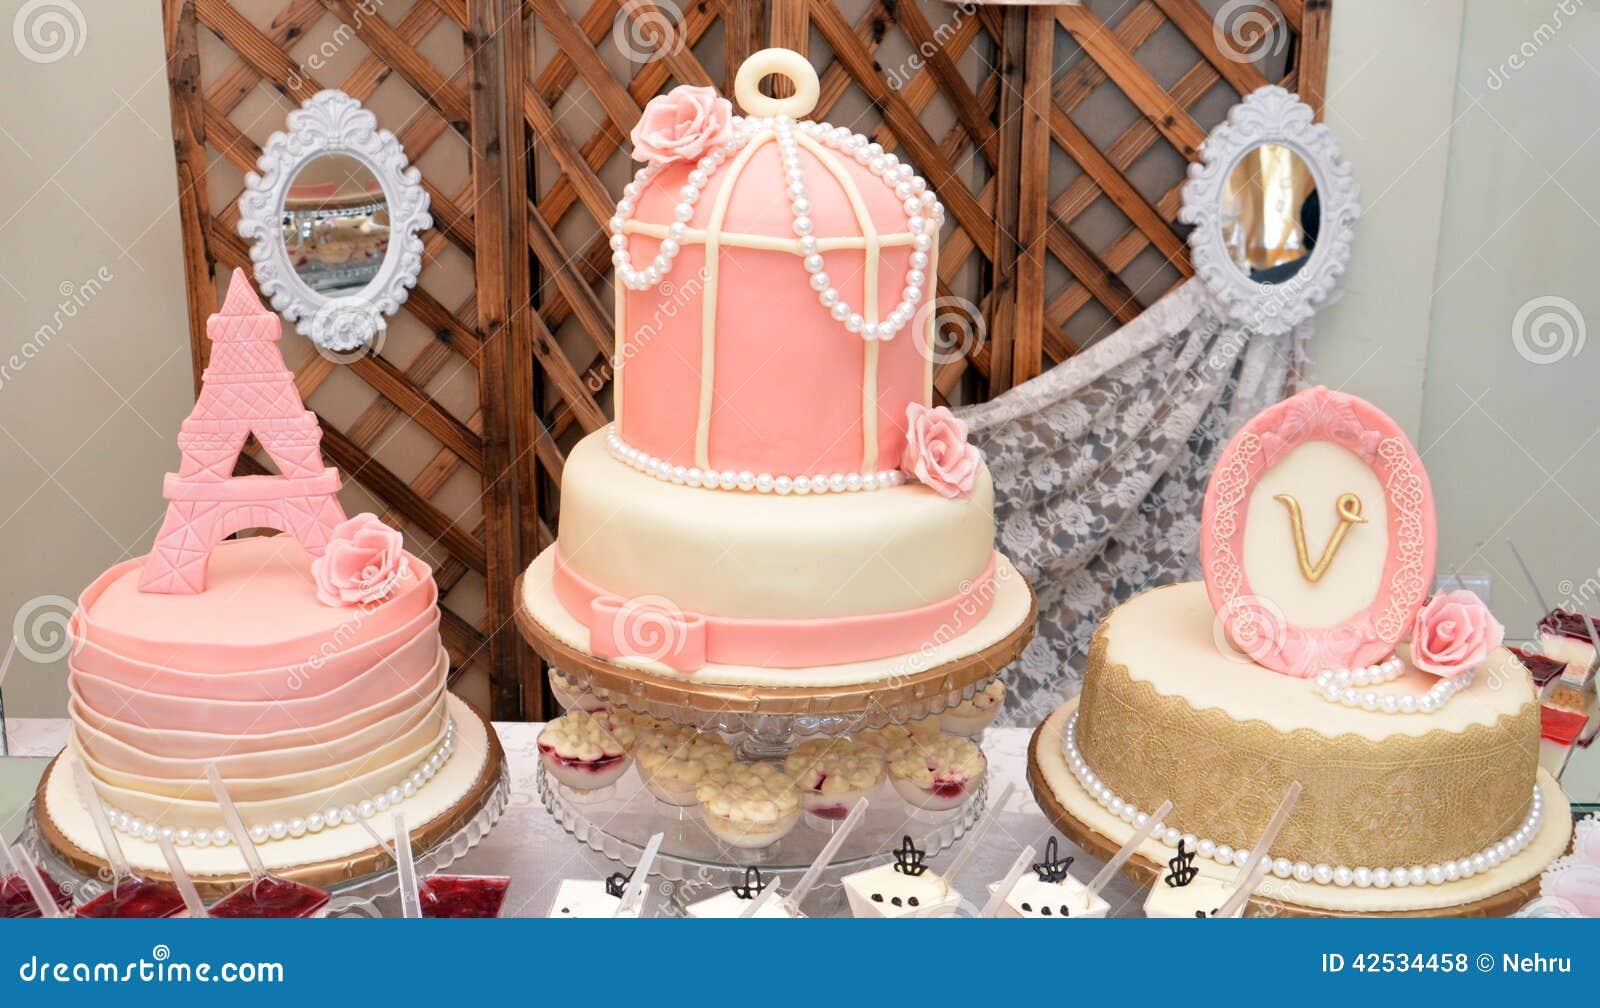 Stupendous Luxury Baby Girl Birthday Cake Stock Photo Image Of Bows Funny Birthday Cards Online Inifodamsfinfo